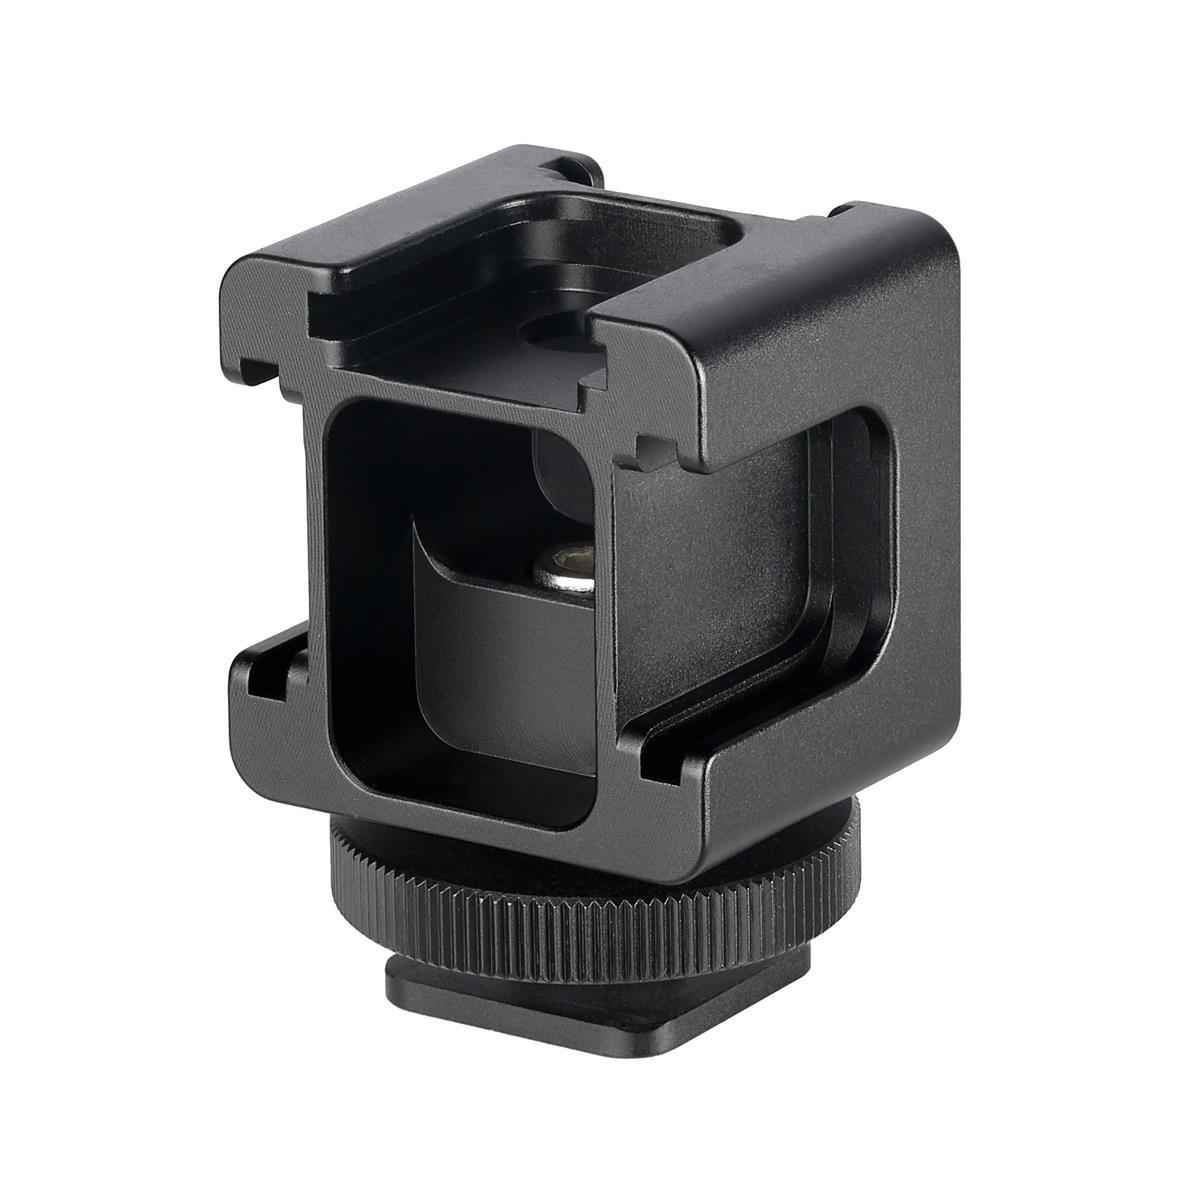 Leofoto 4 in 1 Cold Shoe Adapter FA-07